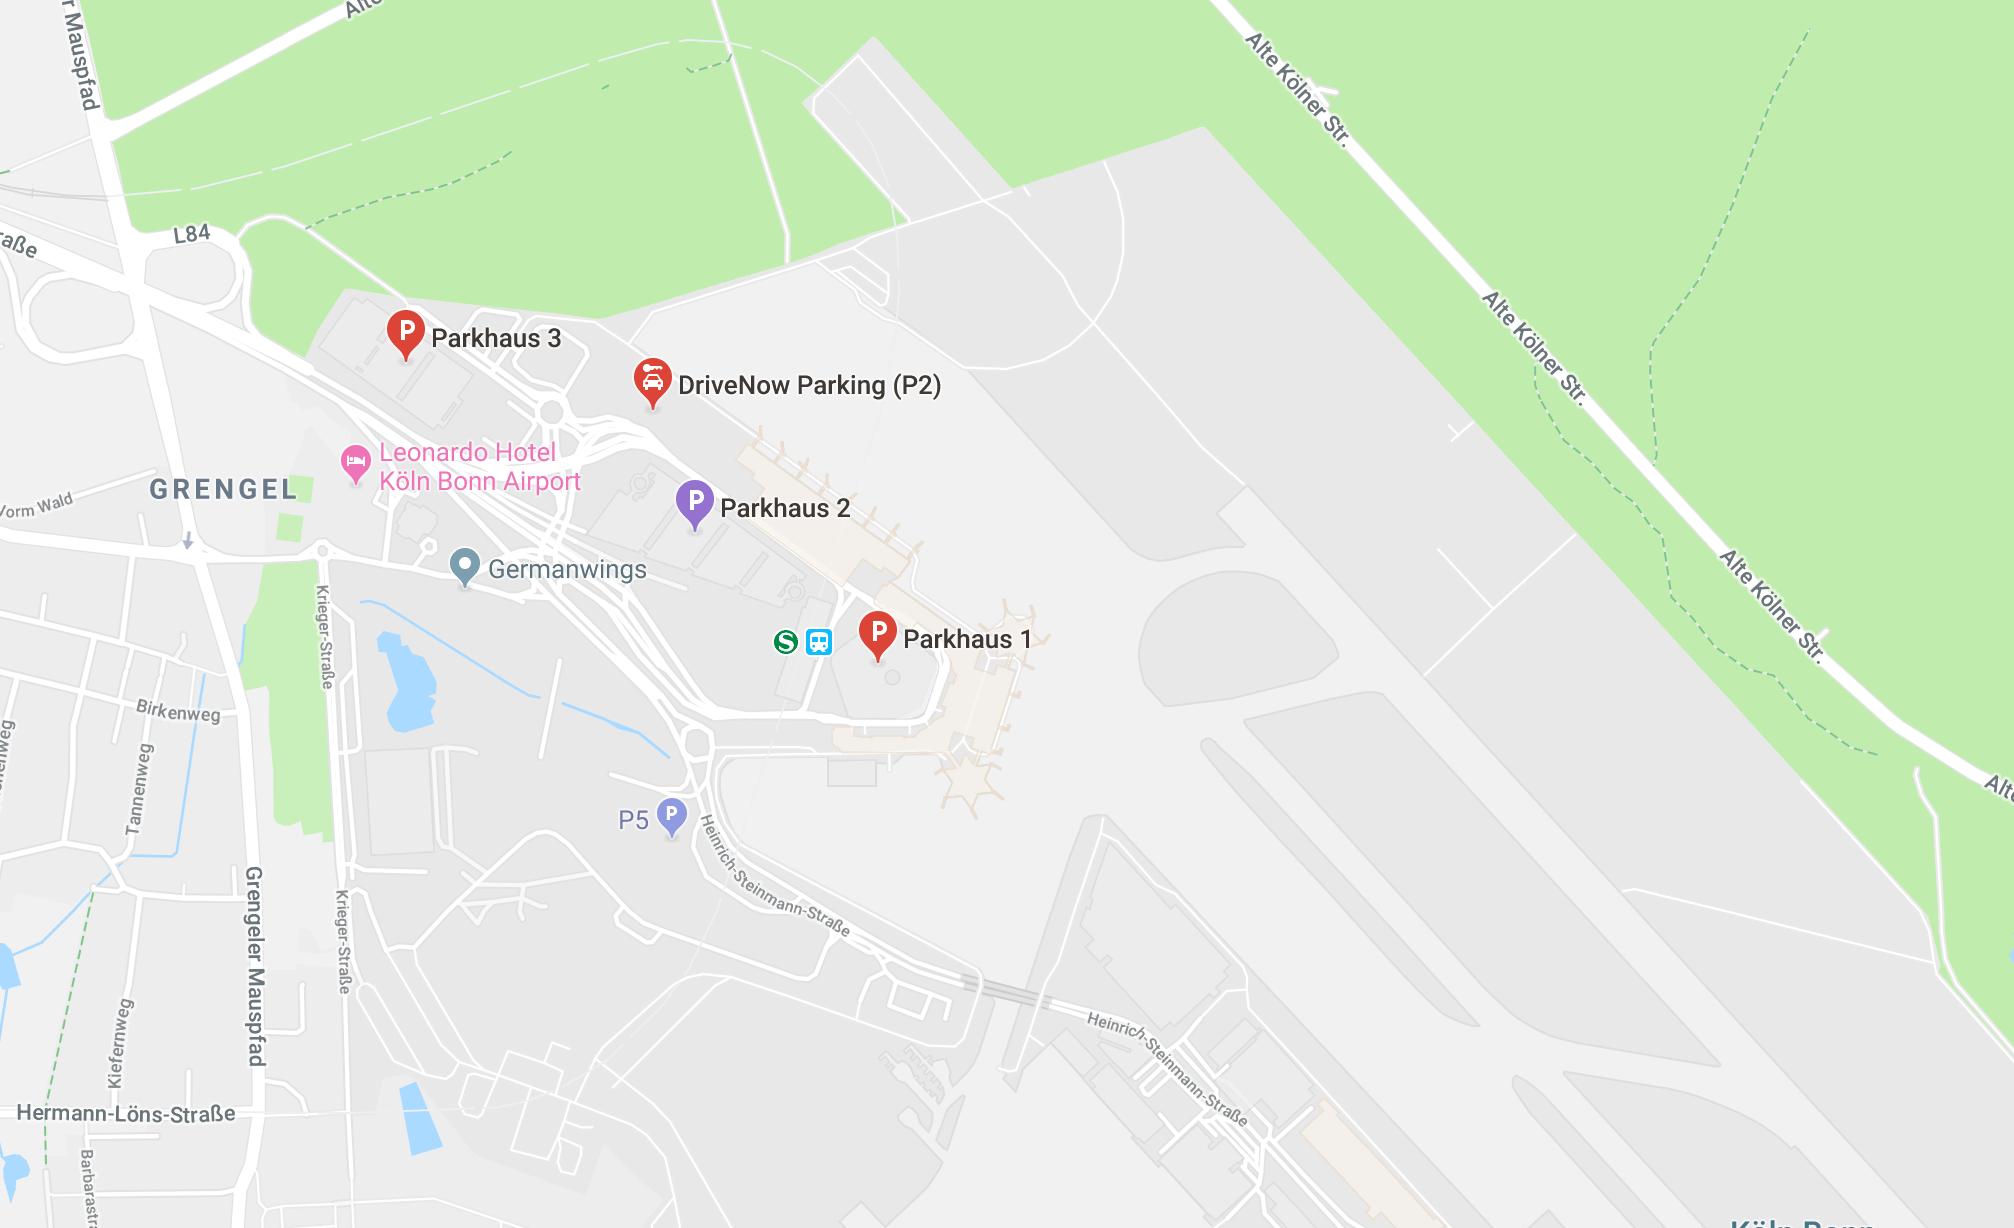 Parken am Flughafen Köln Bonn Parkhaus Lage Karte